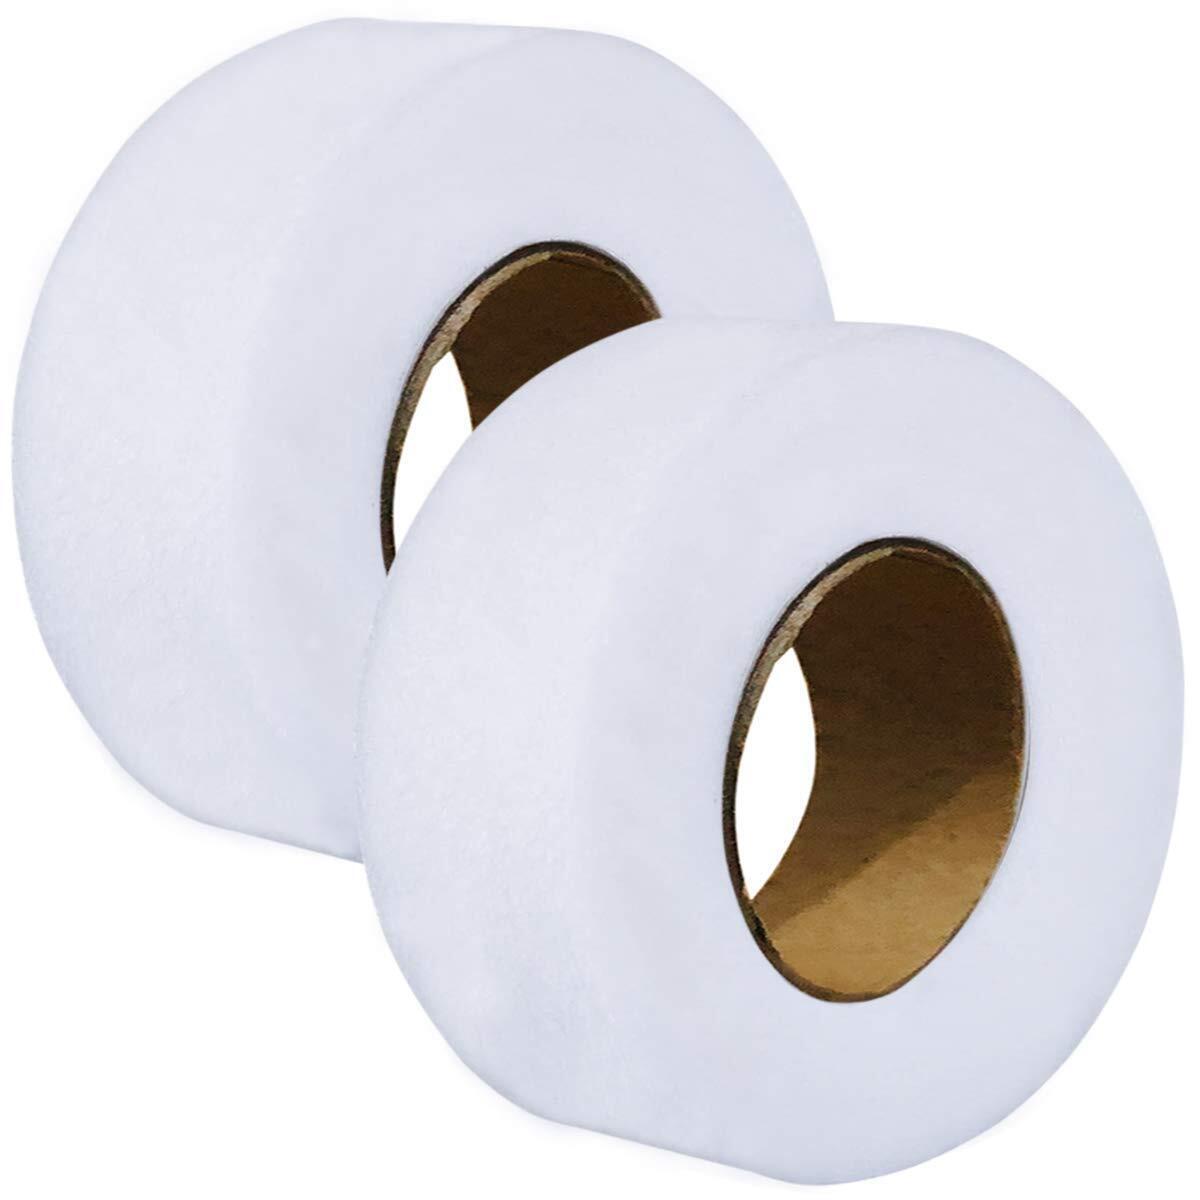 2pcs Hem Tape Iron-On Adhesive Fabric Fusing Tape Each 27 Yards Length, 1 inch/2.5cm Width